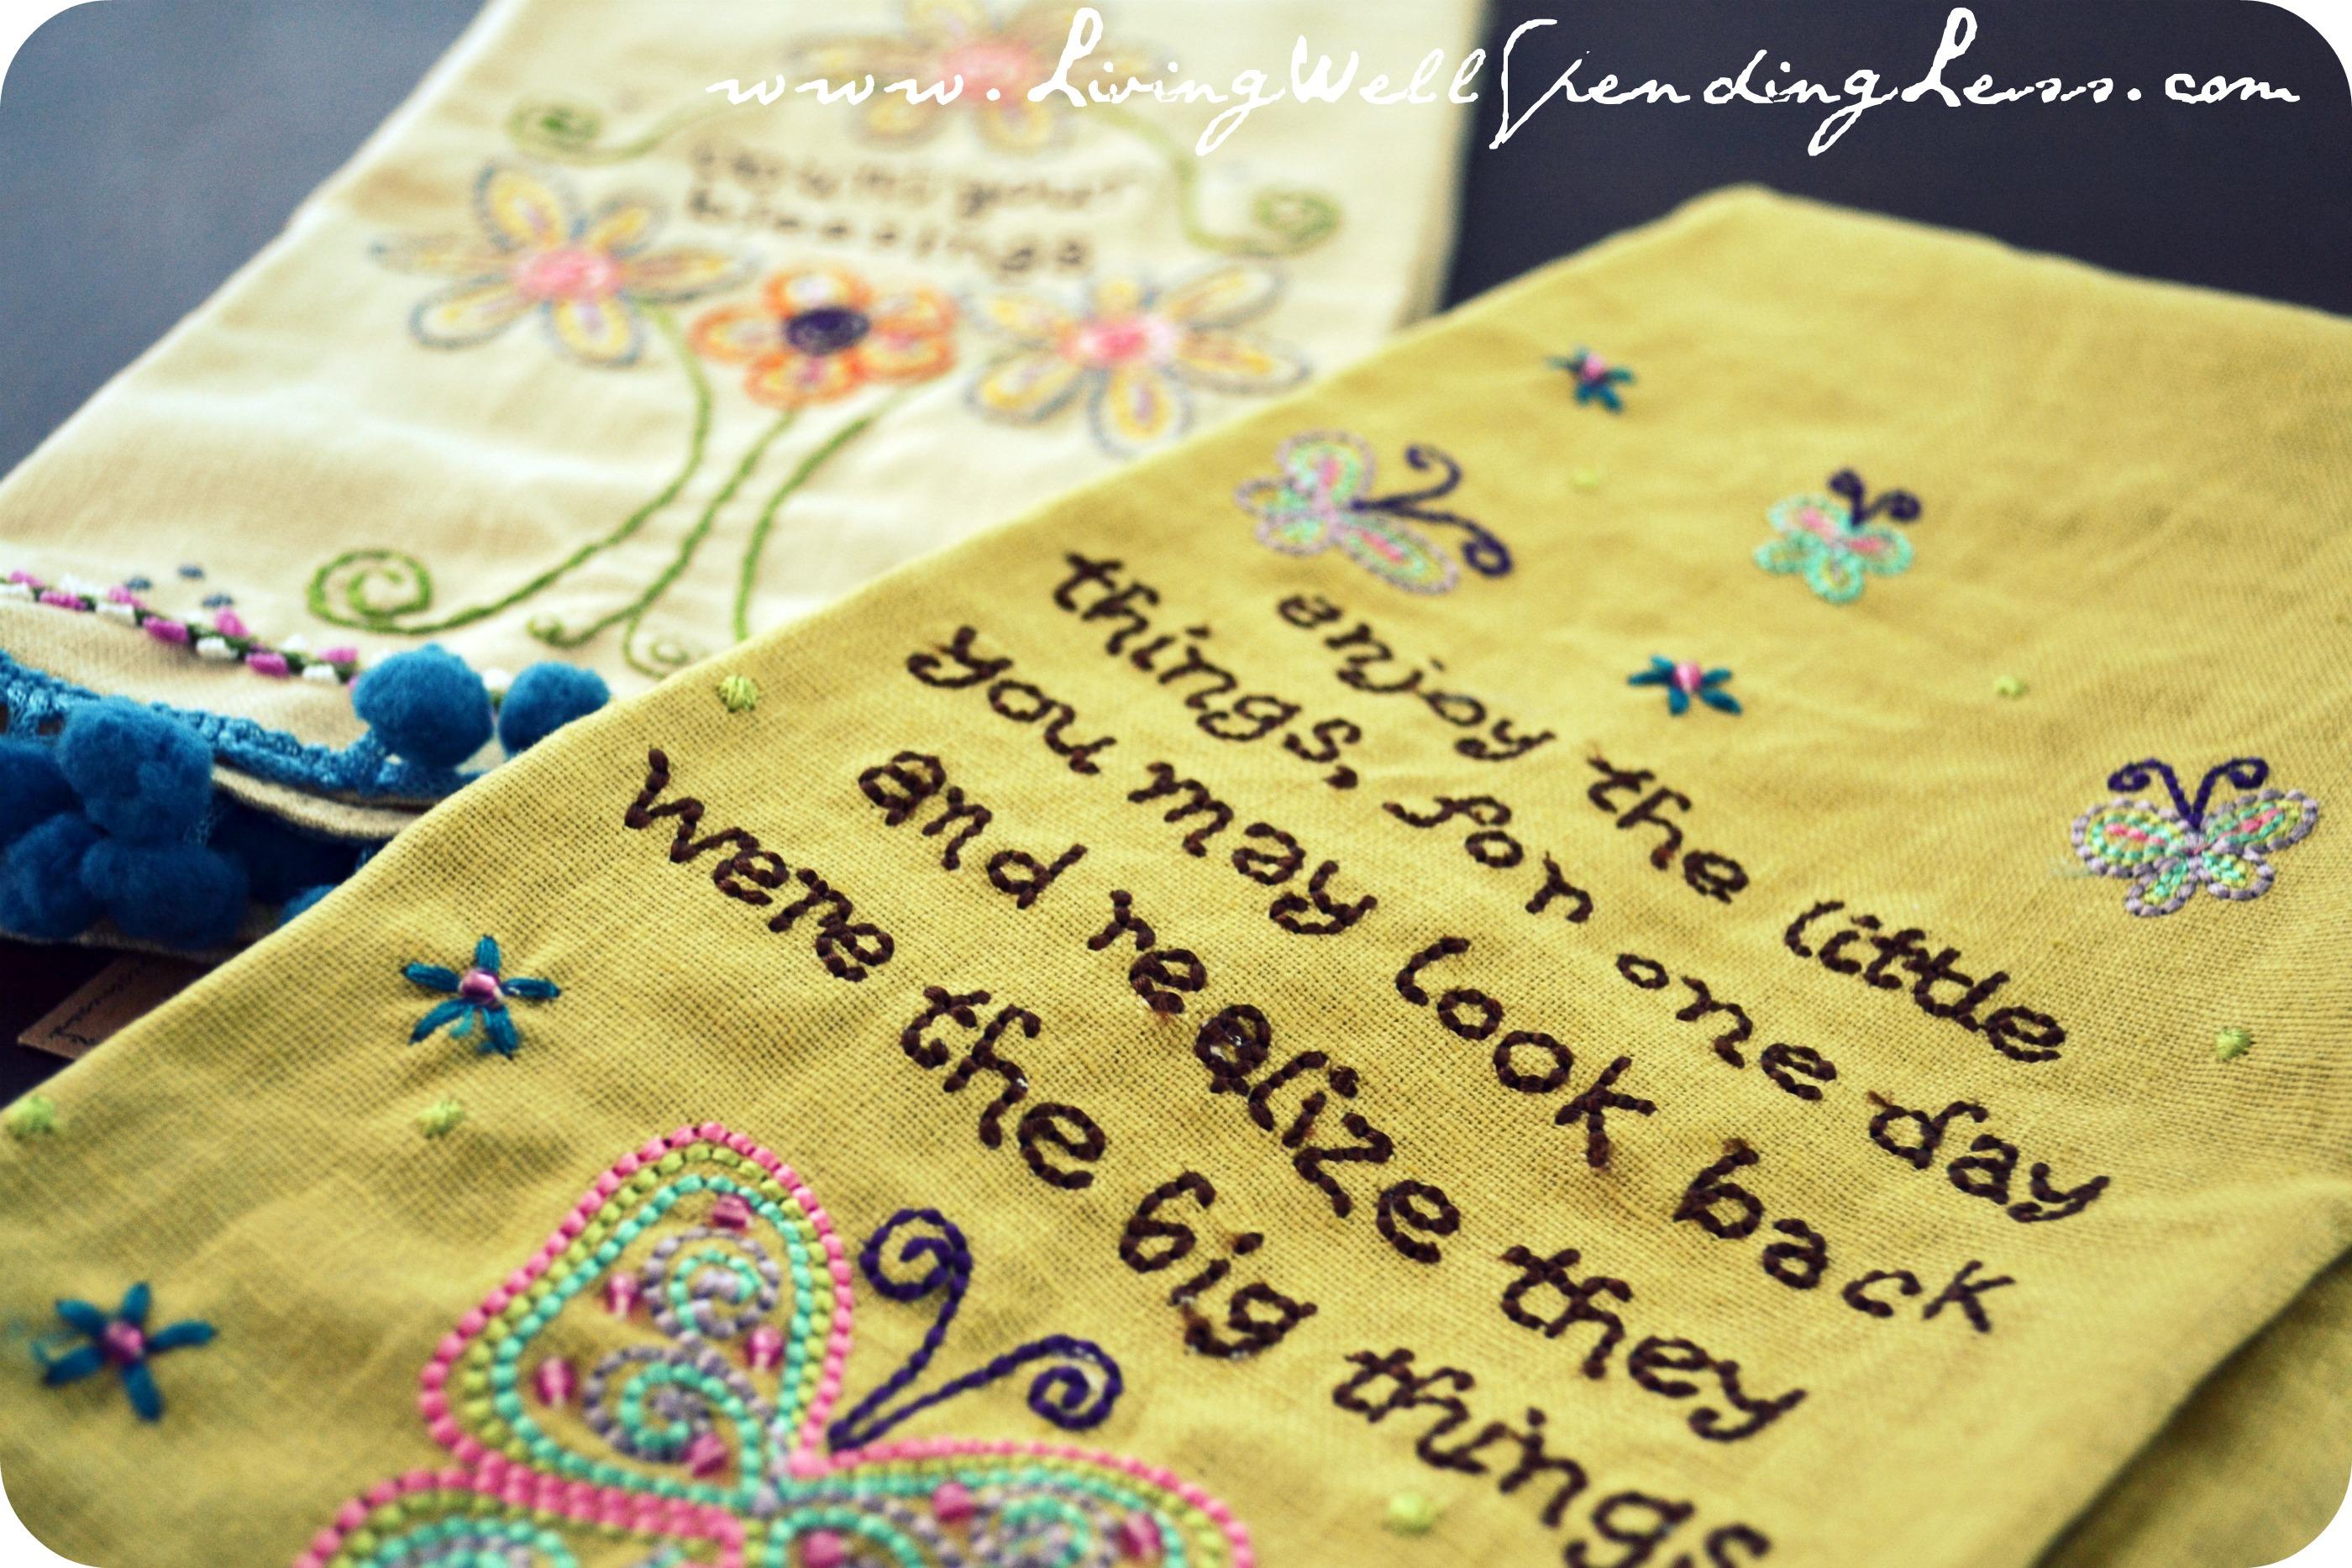 Towel quote #1